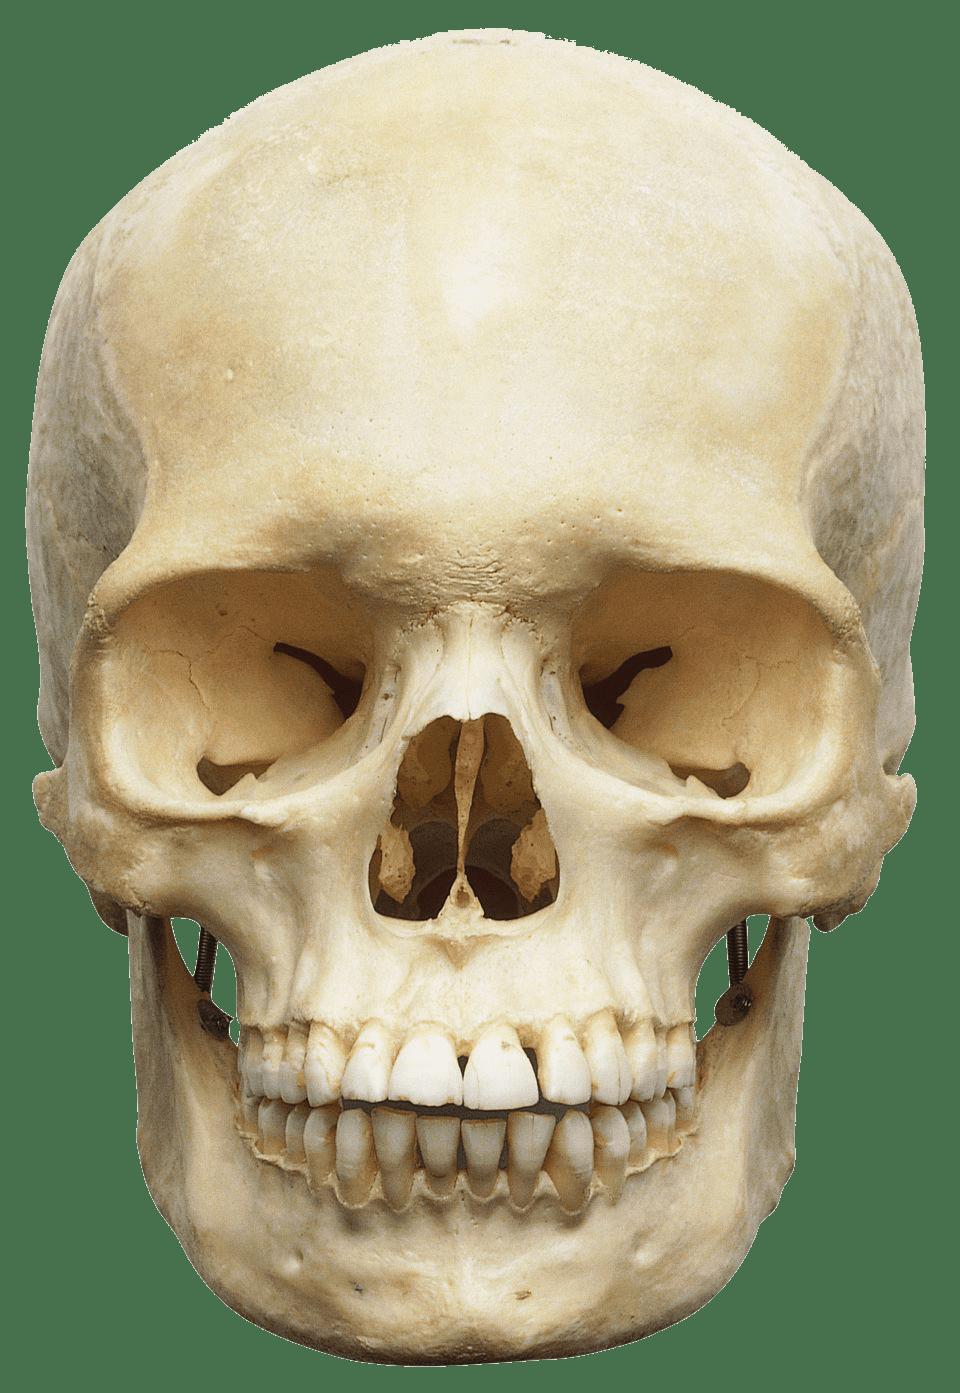 Skull PNG Image